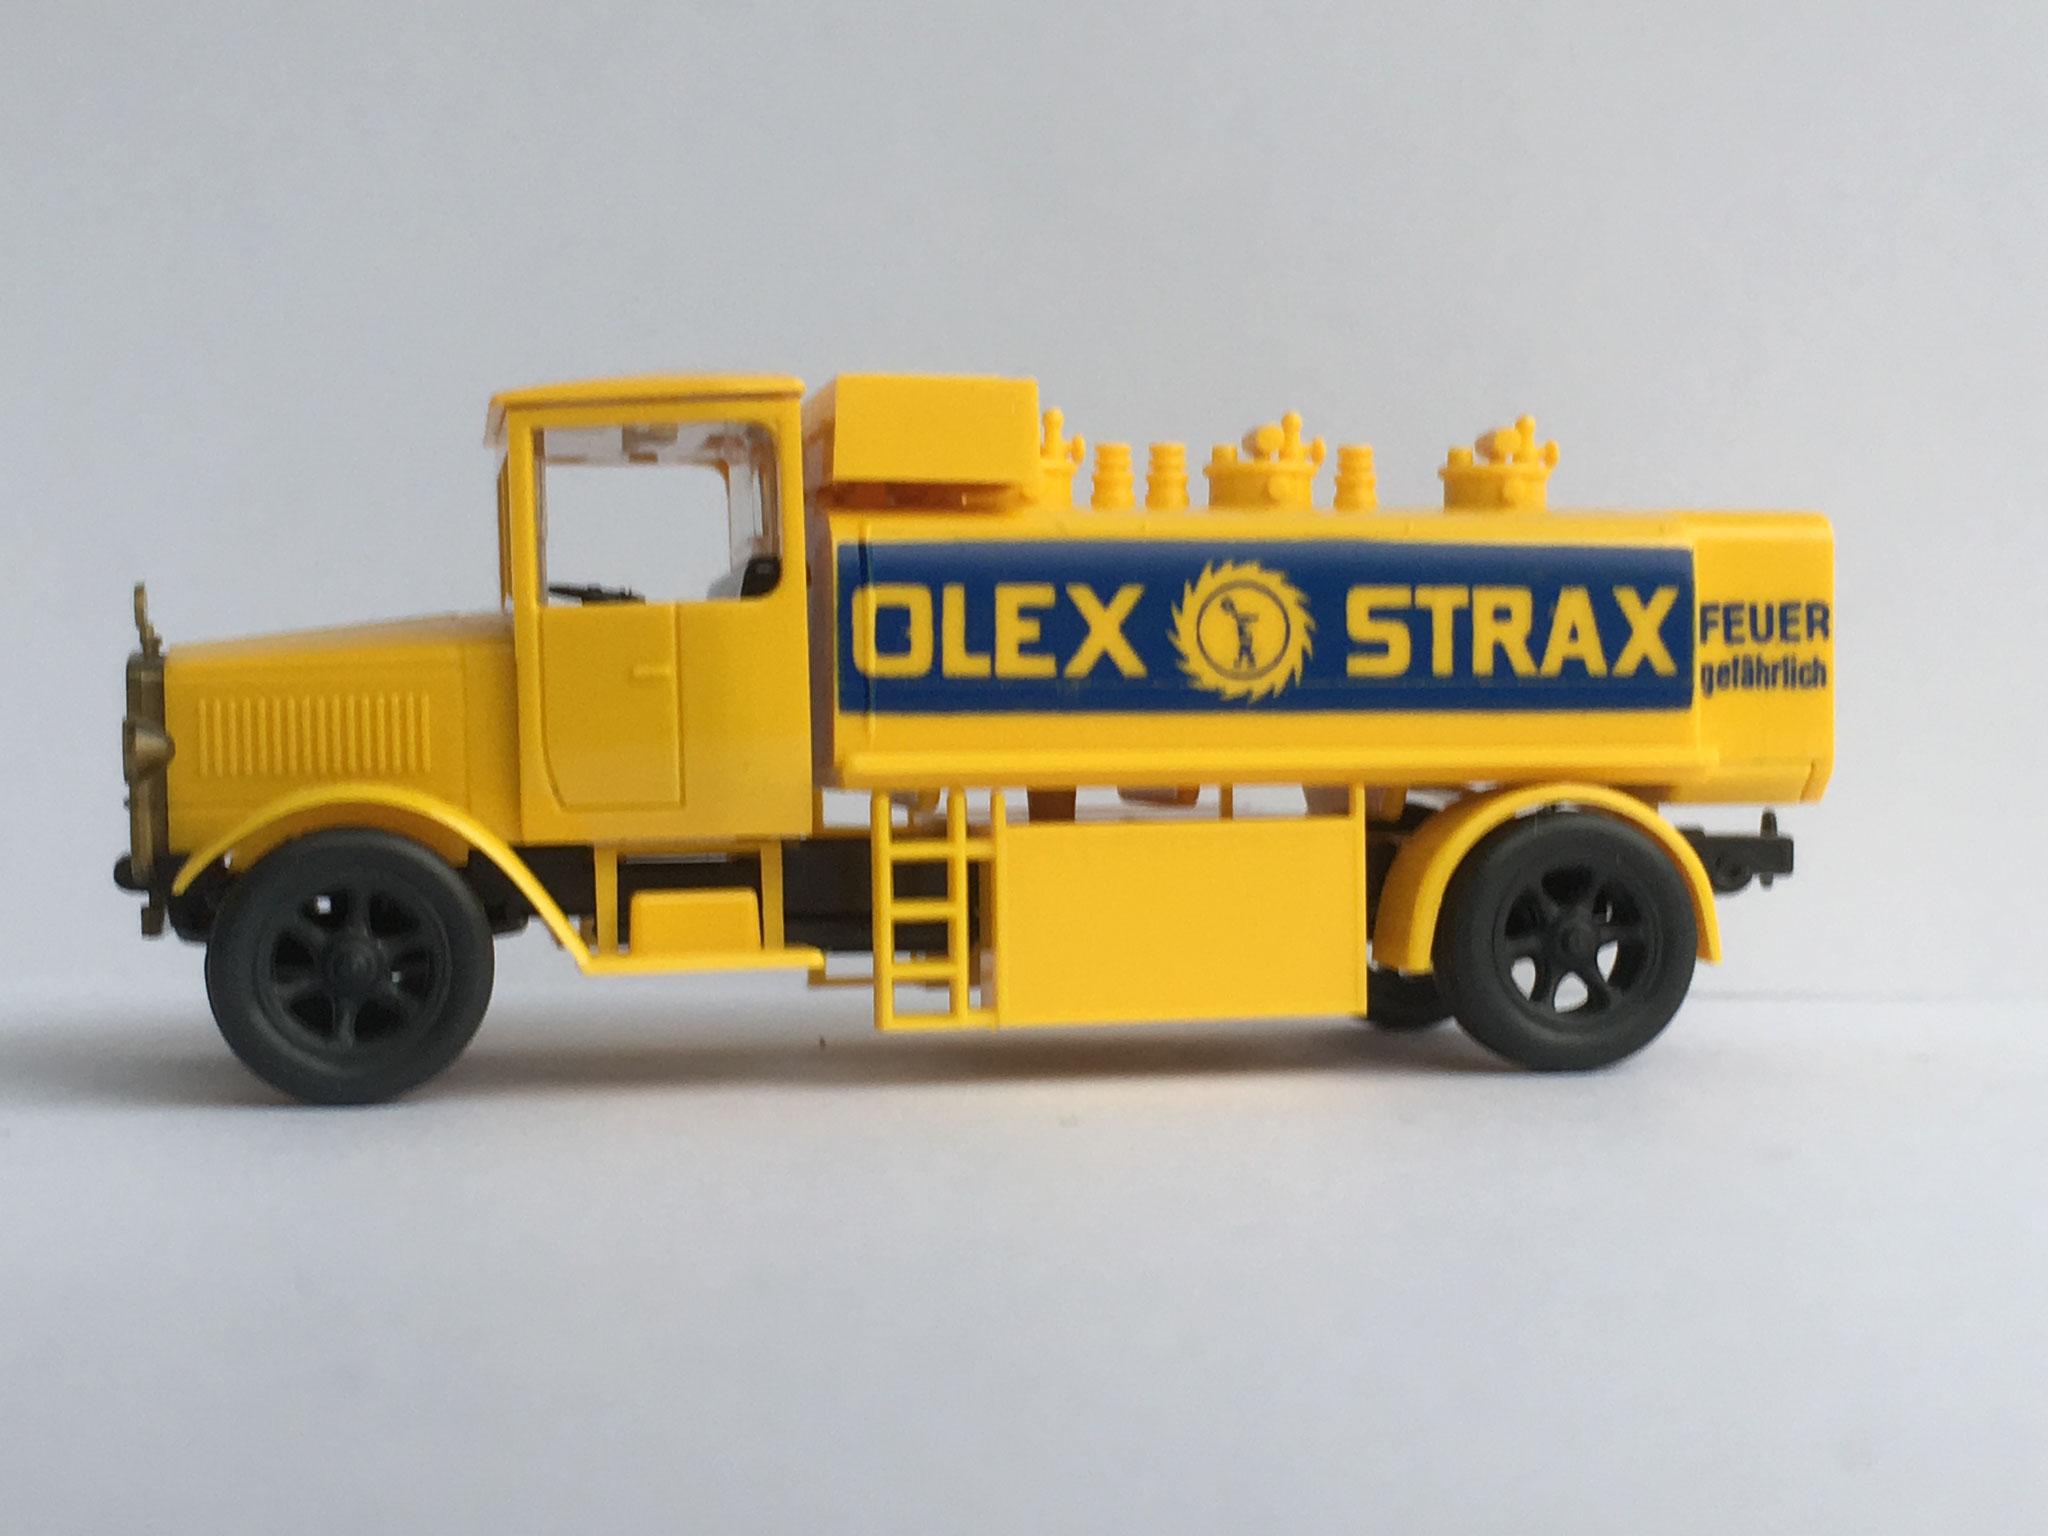 Mercedes L5 Tankwagen OLEX STRAX, Variante 2, Art. Nr. 1017 (ab 1989 im Programm)